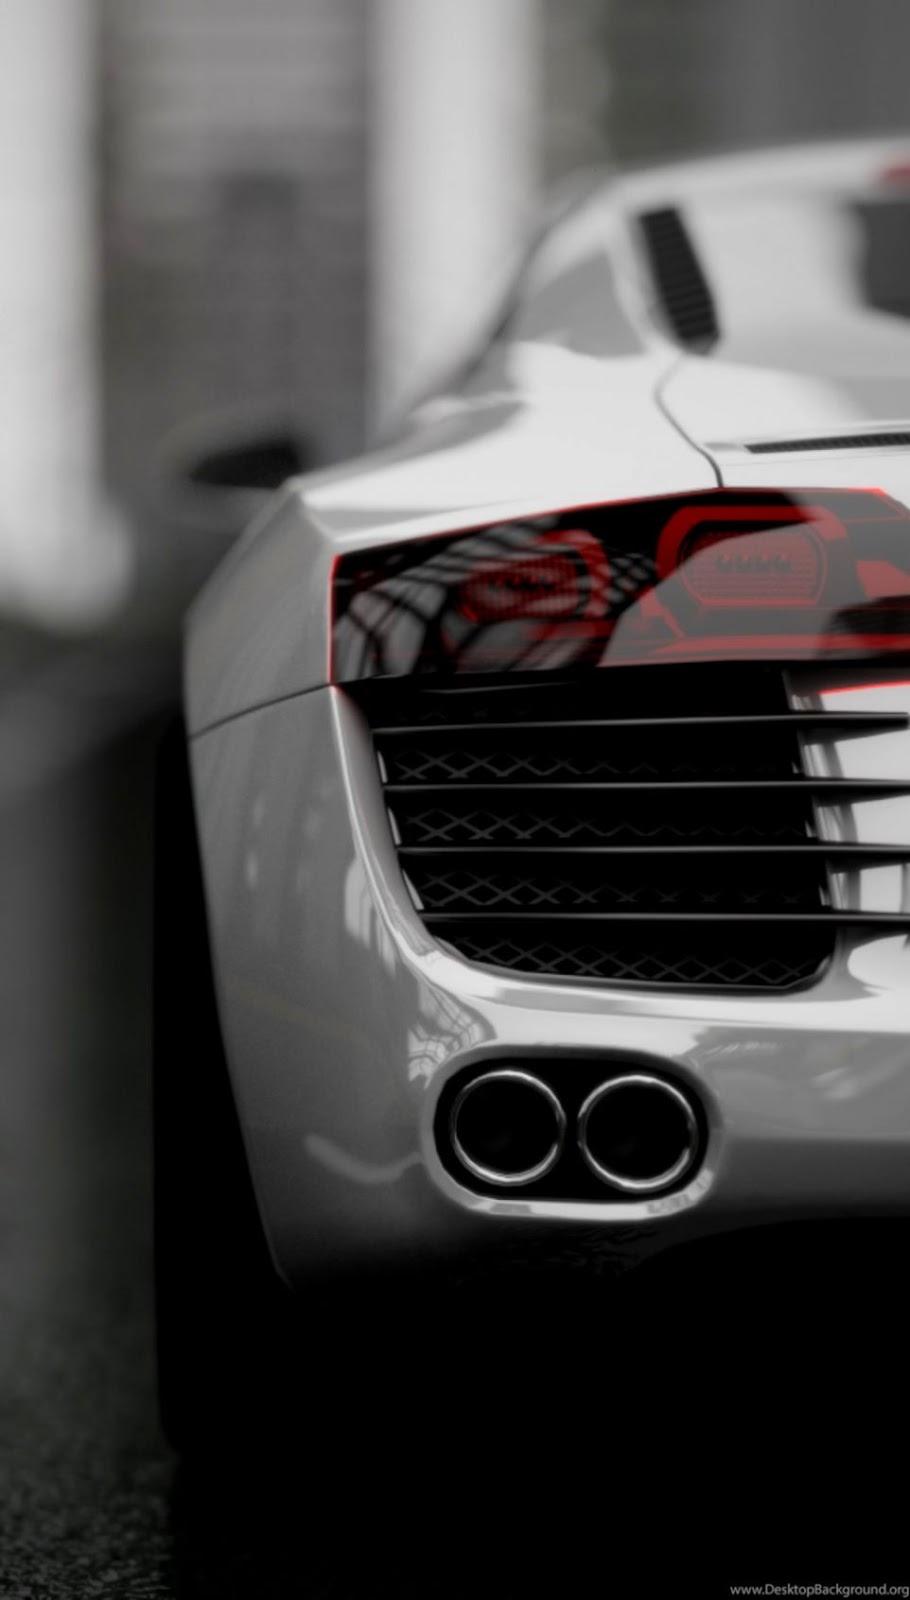 Audi R8 Iphone Wallpaper Find Wallpapers 910x1600 Download Hd Wallpaper Wallpapertip